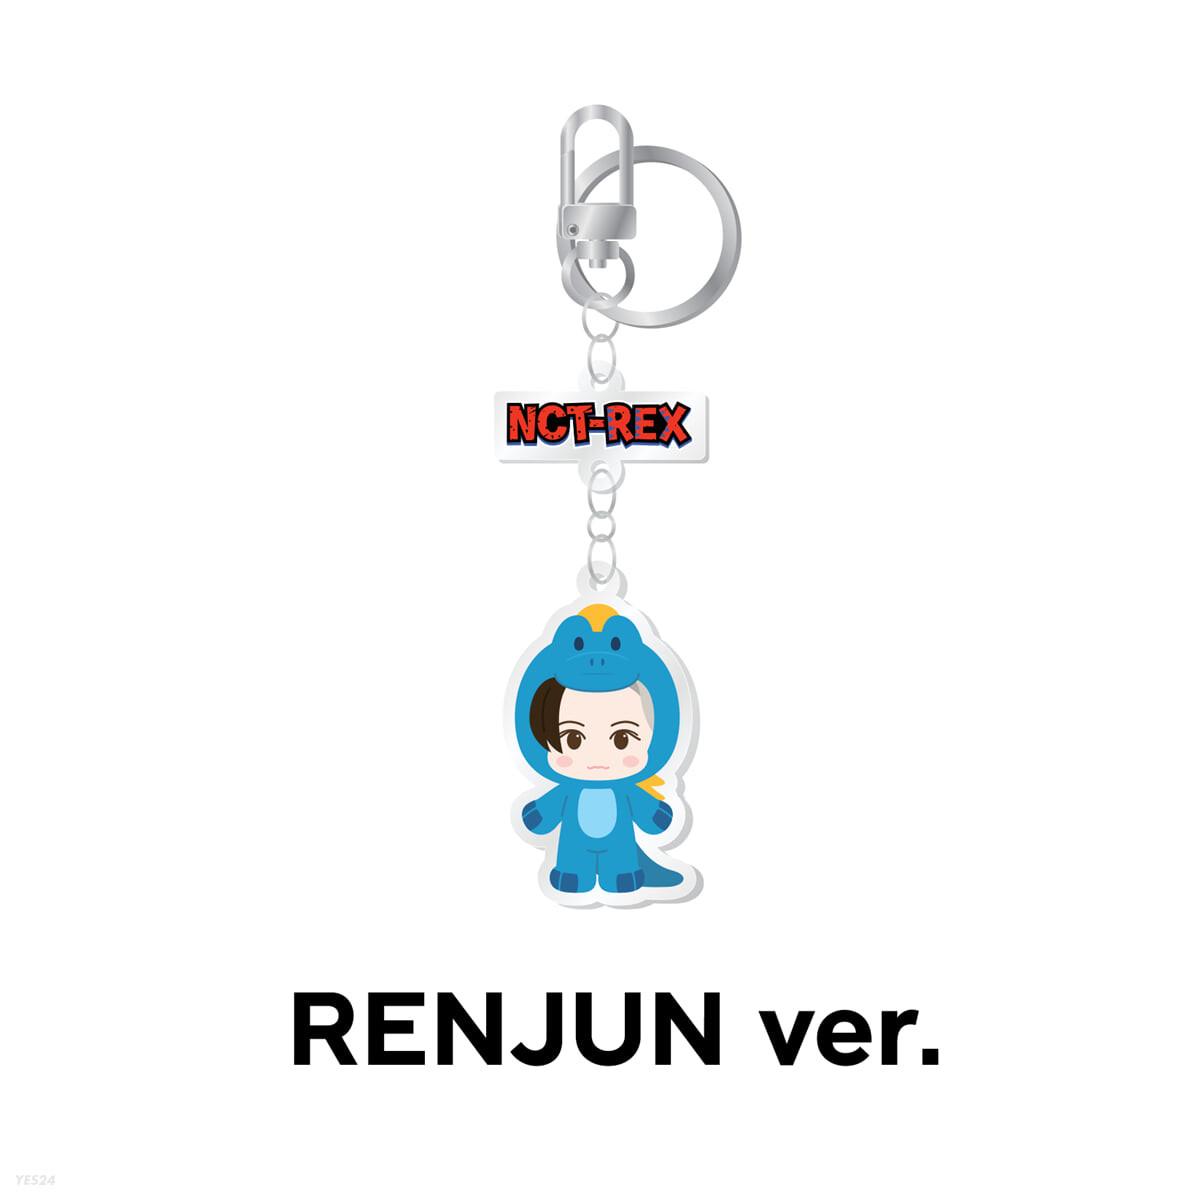 [RENJUN] ACRYLIC KEY RING - NCT DREAM X PINKFONG